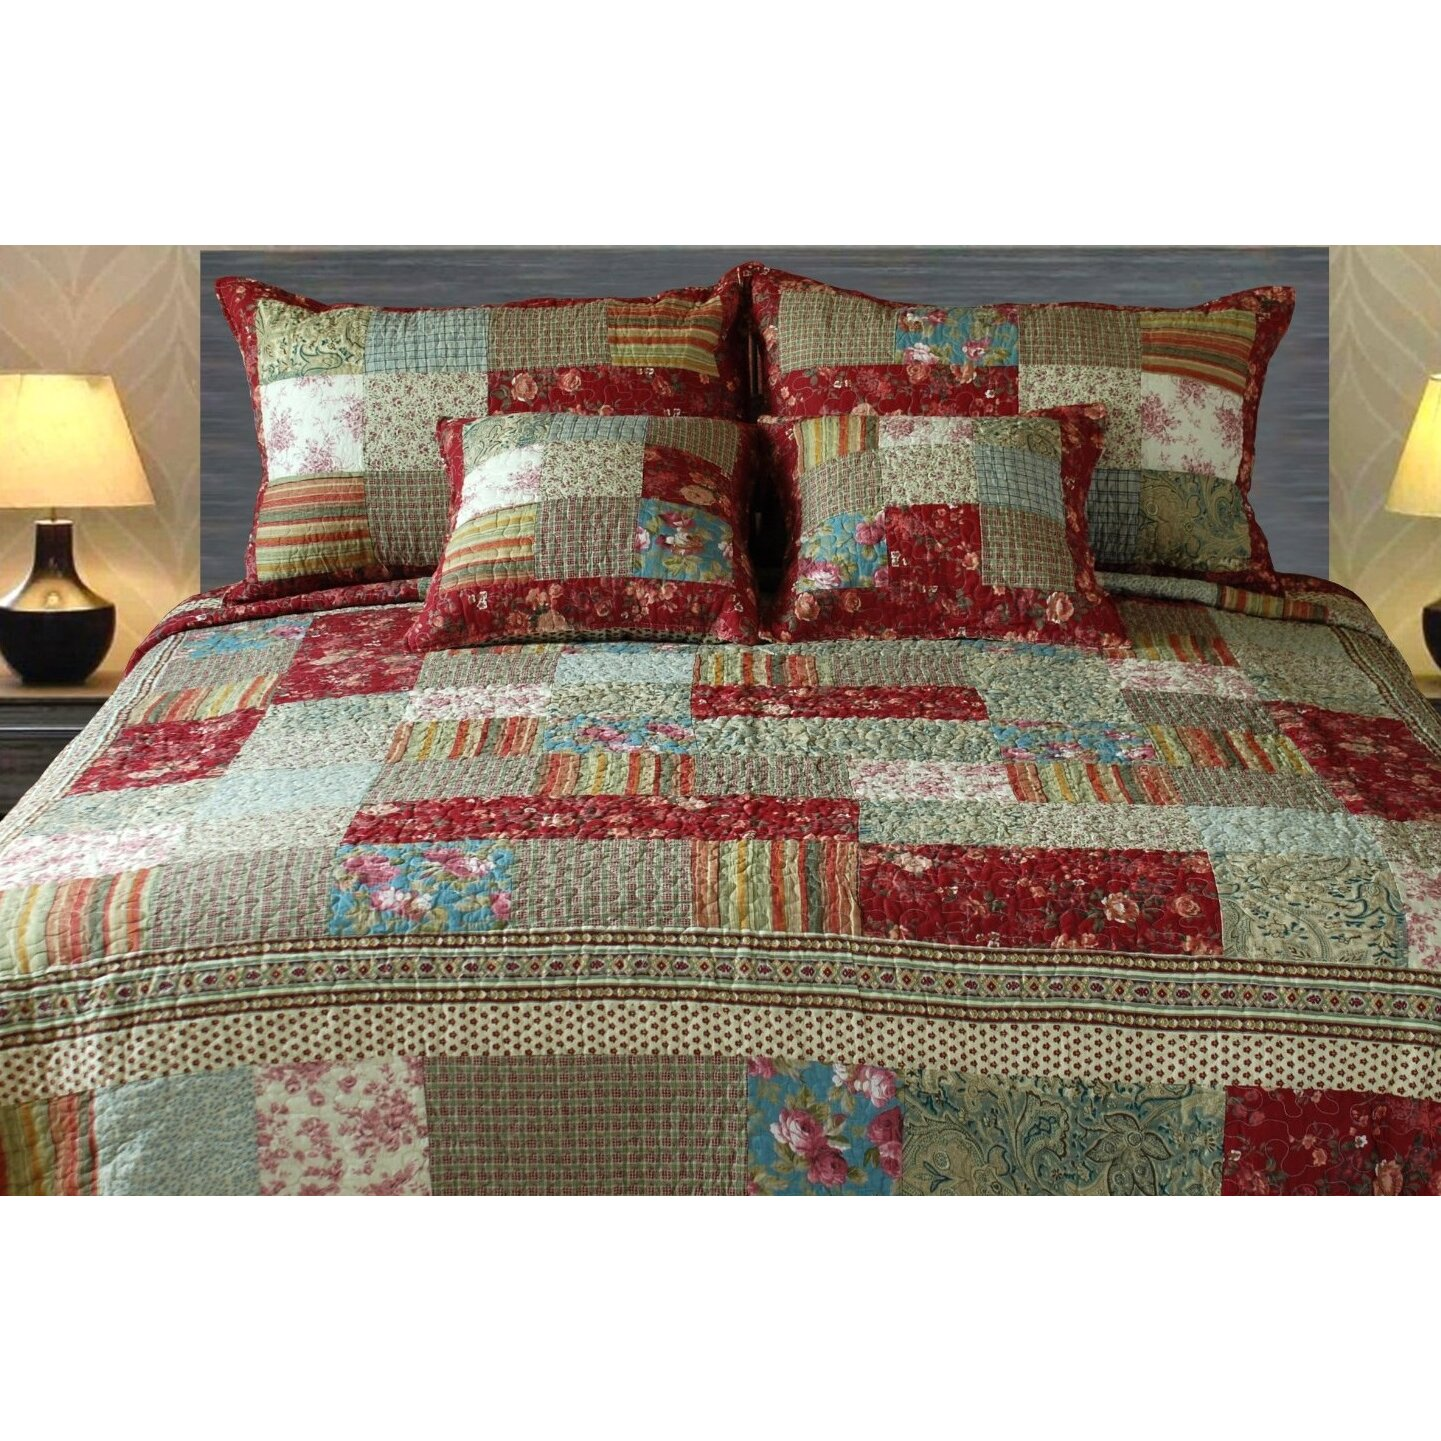 Bed sheet set with quilt - Cotton Charming Fairytale Tea Party Reversible Quilt Set